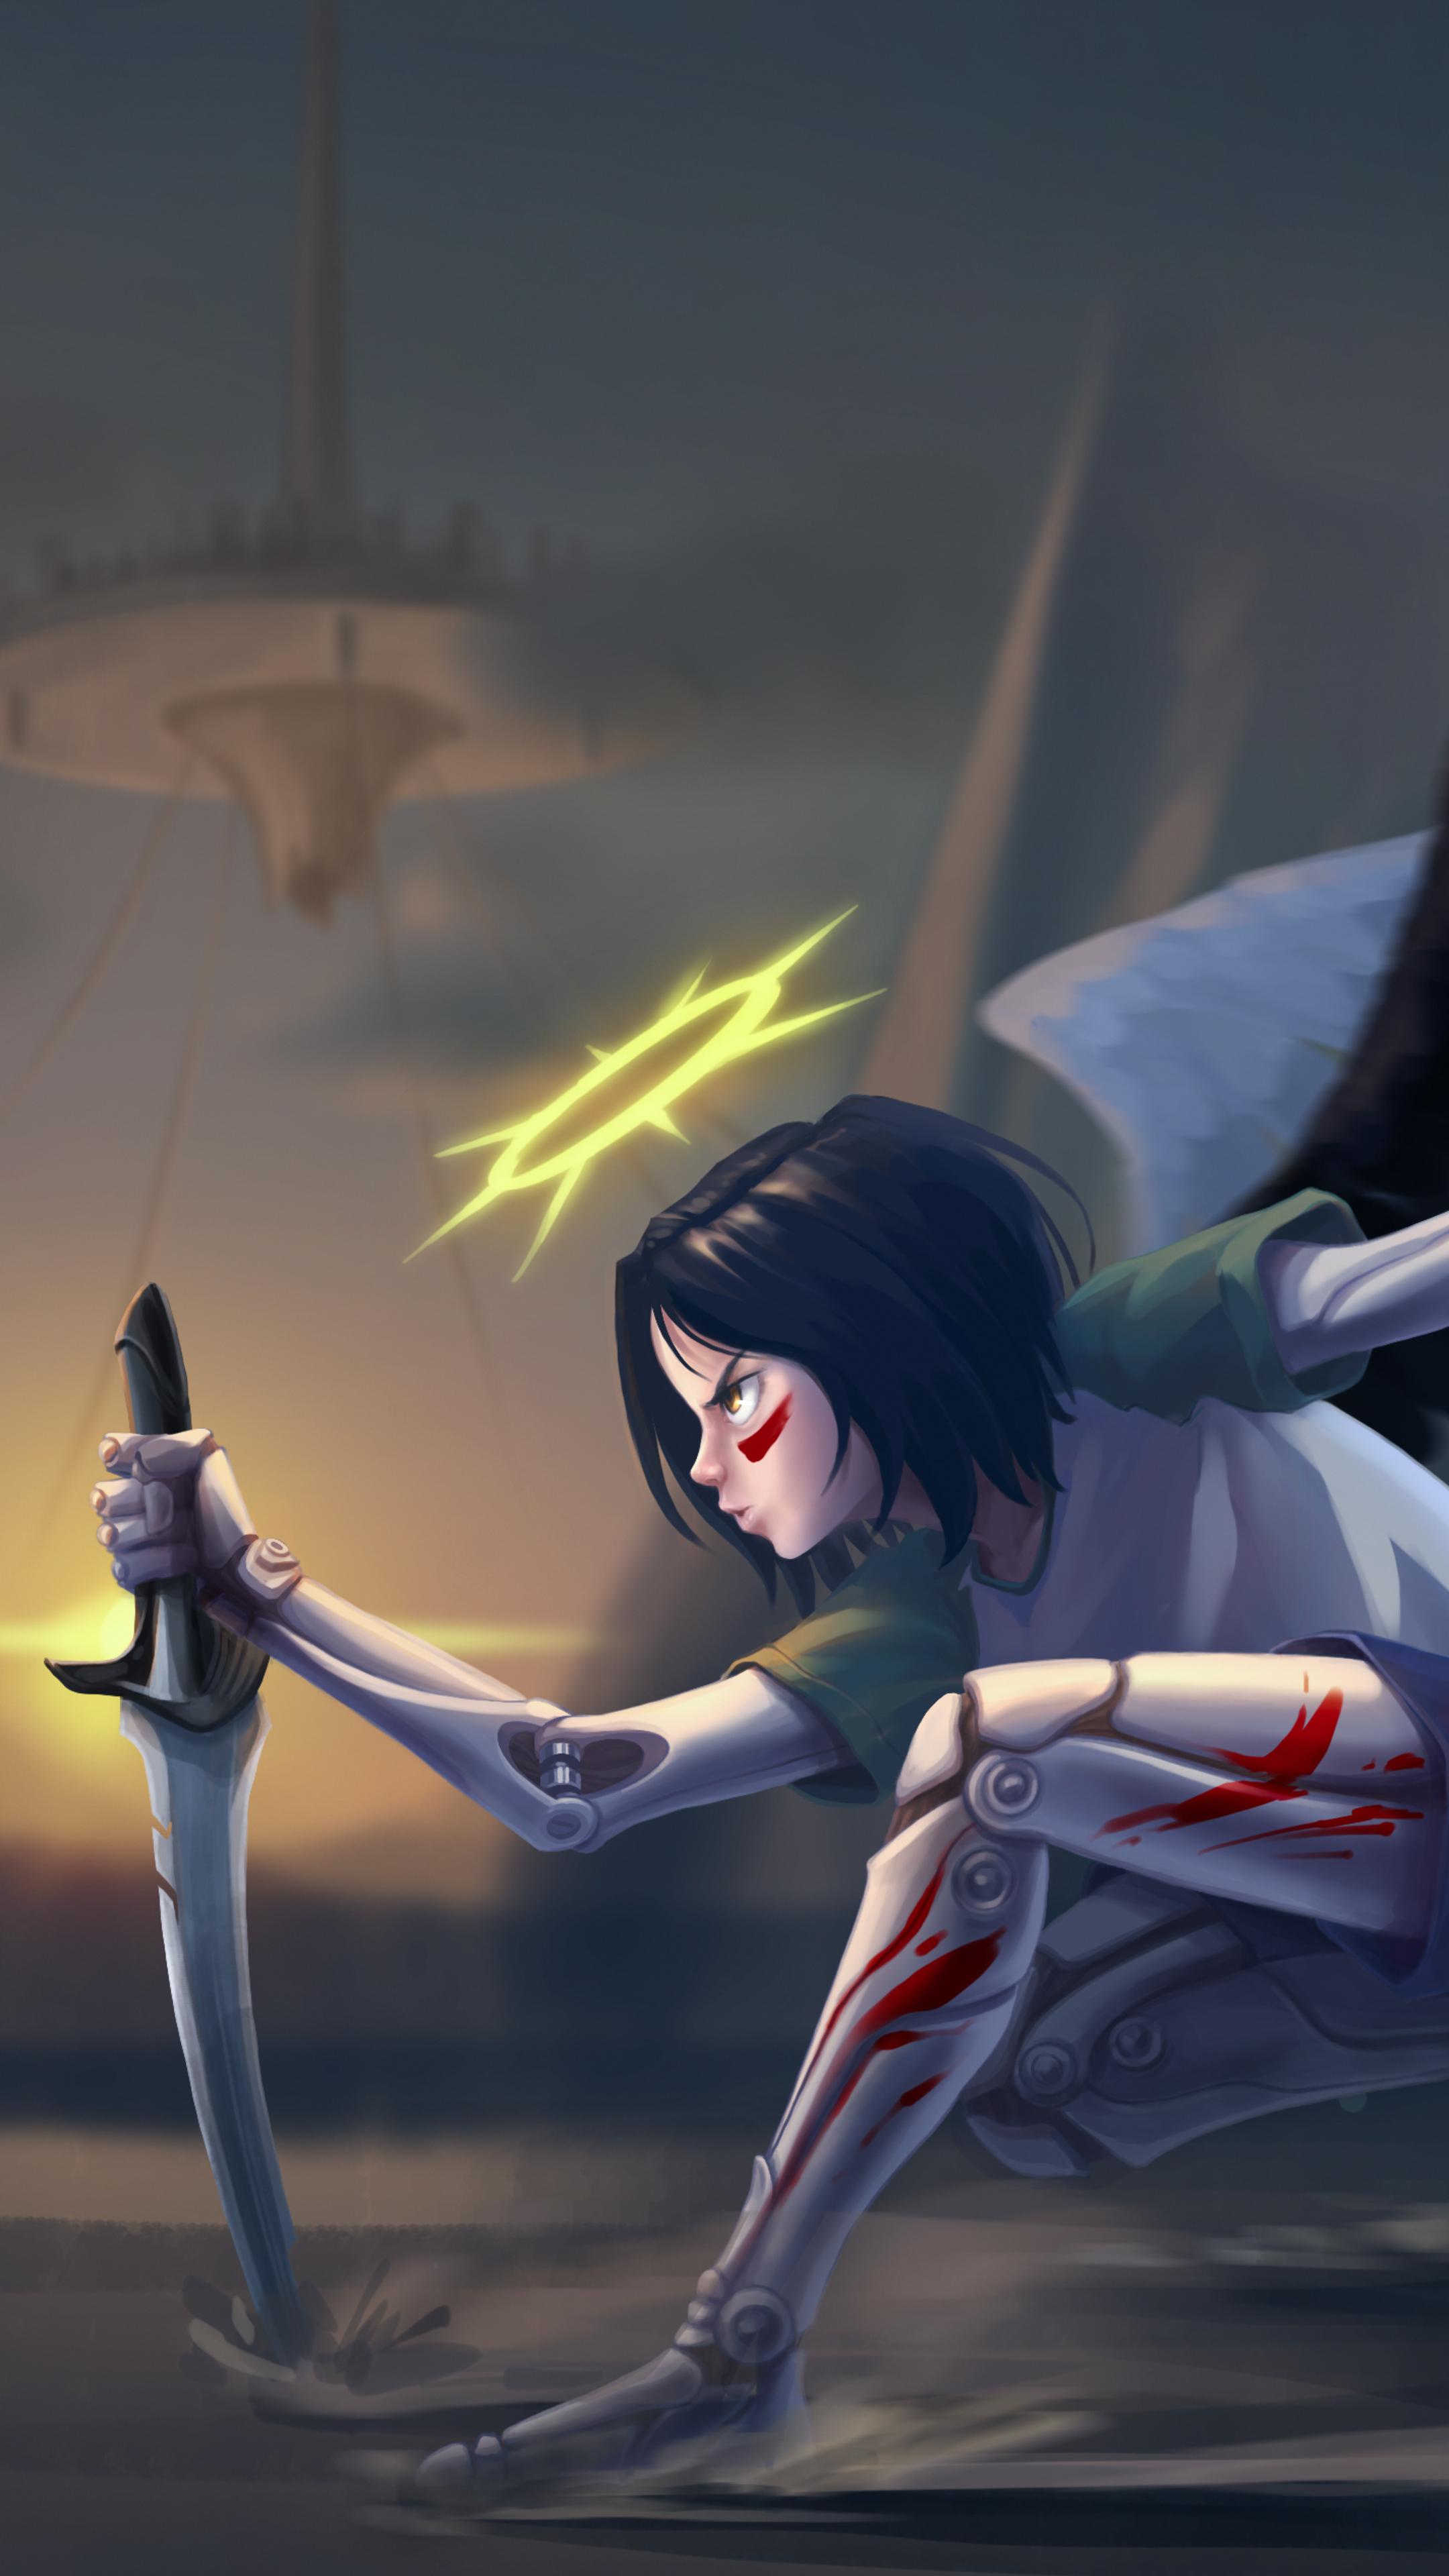 alita-battle-angel-artwork-va.jpg